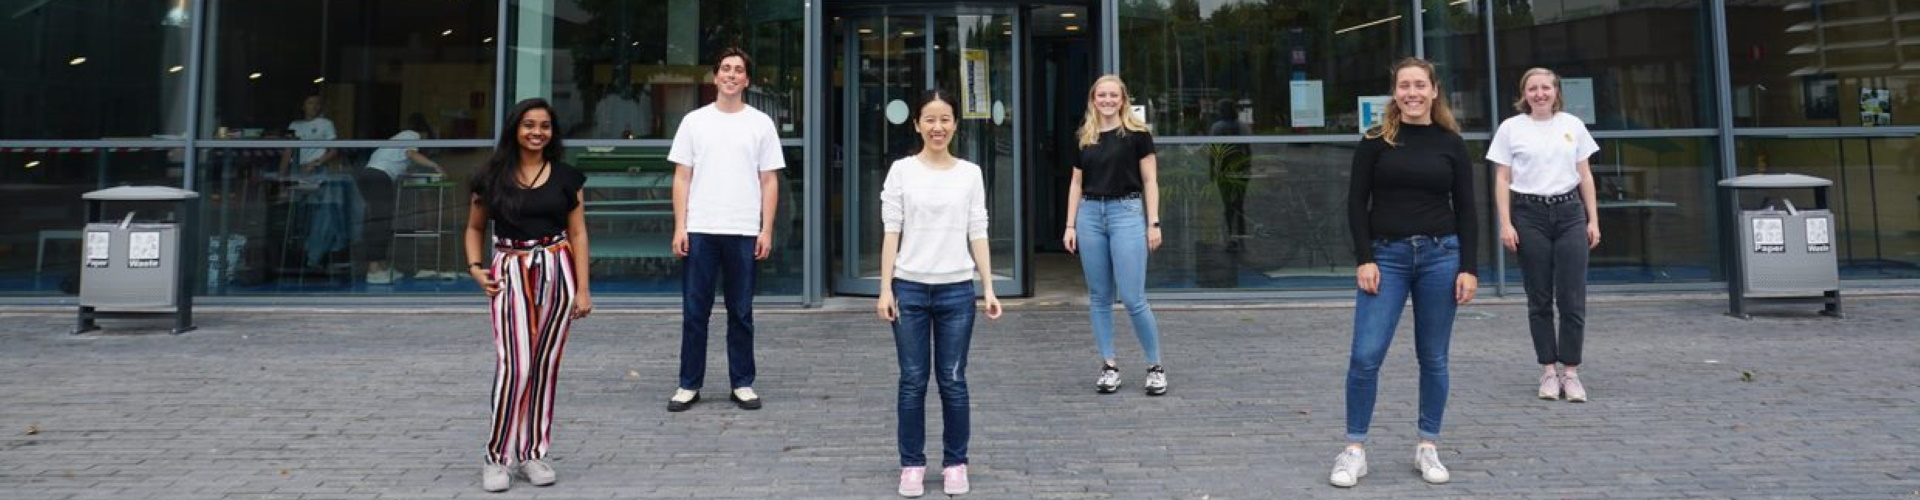 TU Delft AED 2020 groepsfoto